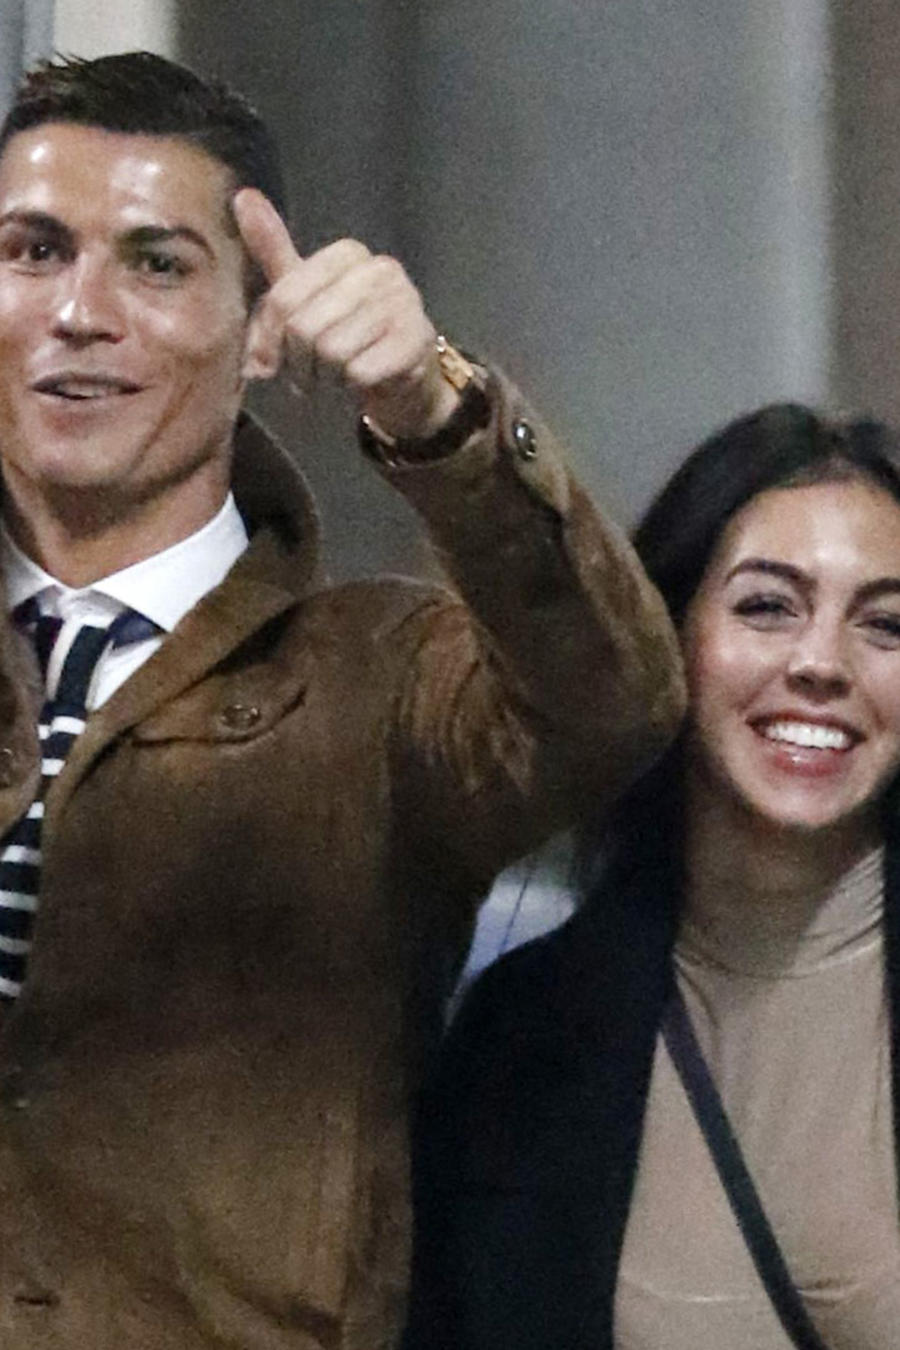 Cristiano Ronaldo sonriendo con Georgina Rodríguez